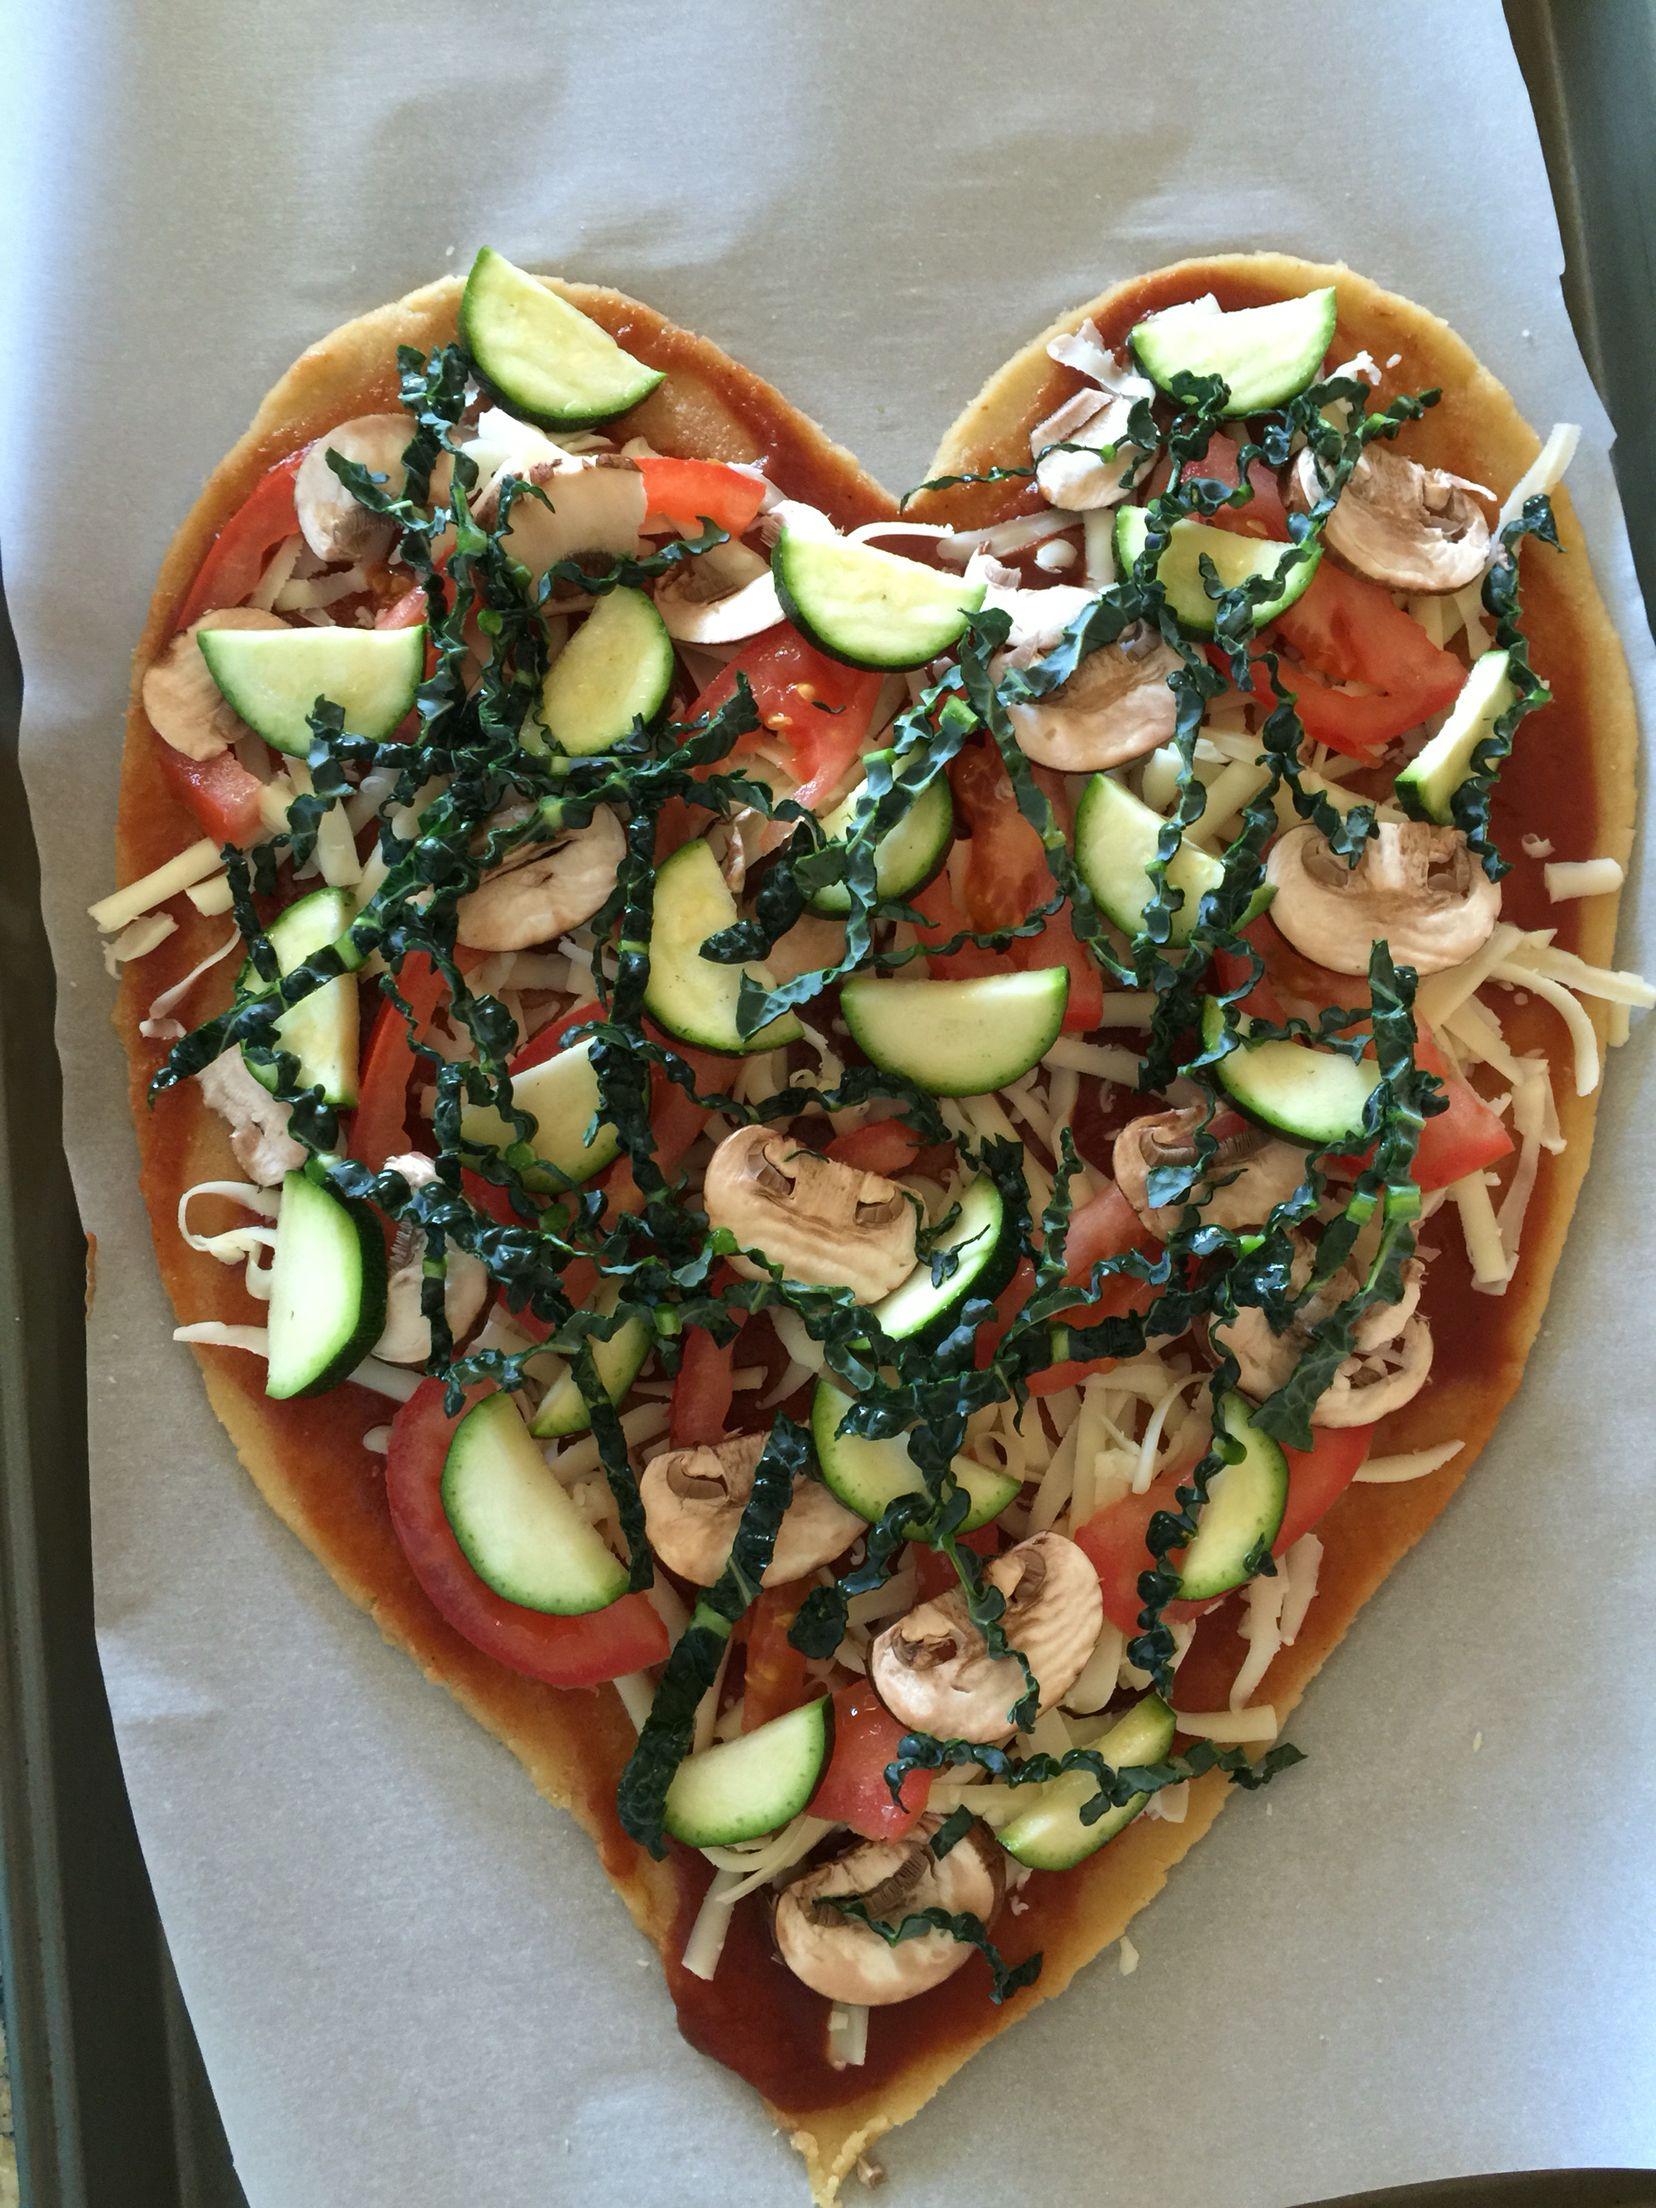 Gluten free, enjoy an Almond flour crust with tasty veg in heart shape by almond lite.com